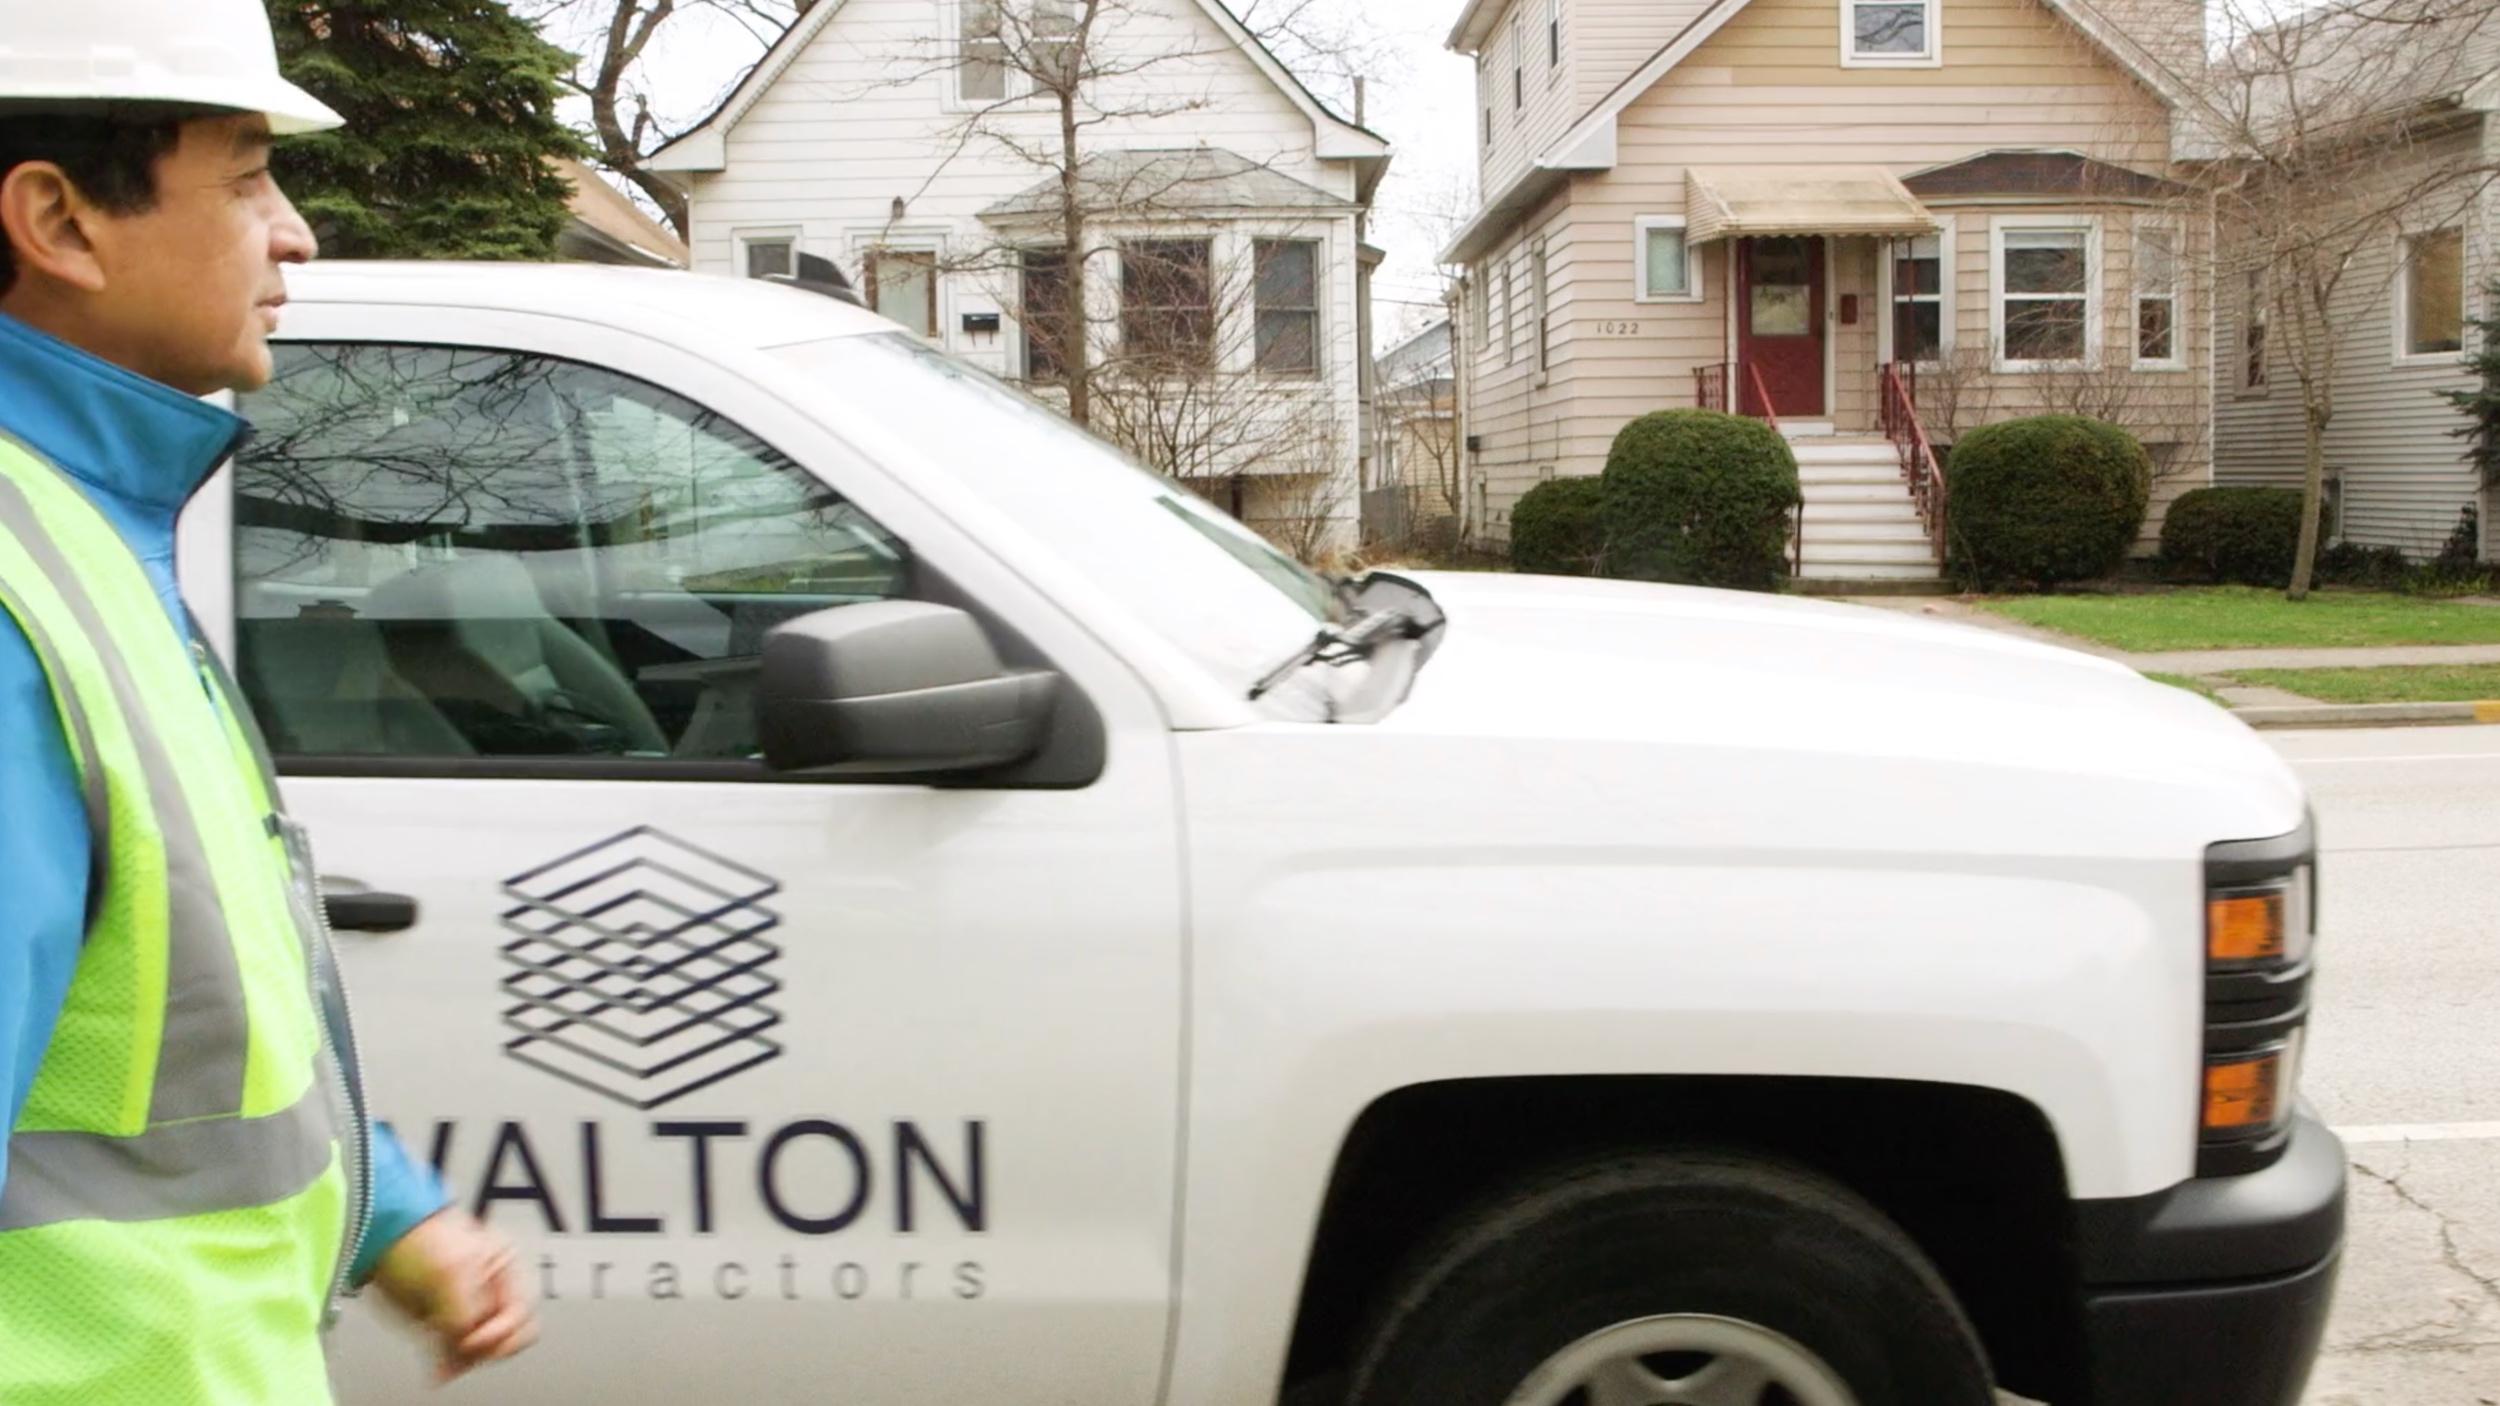 Walton Contractors Broadcast Commercial Video